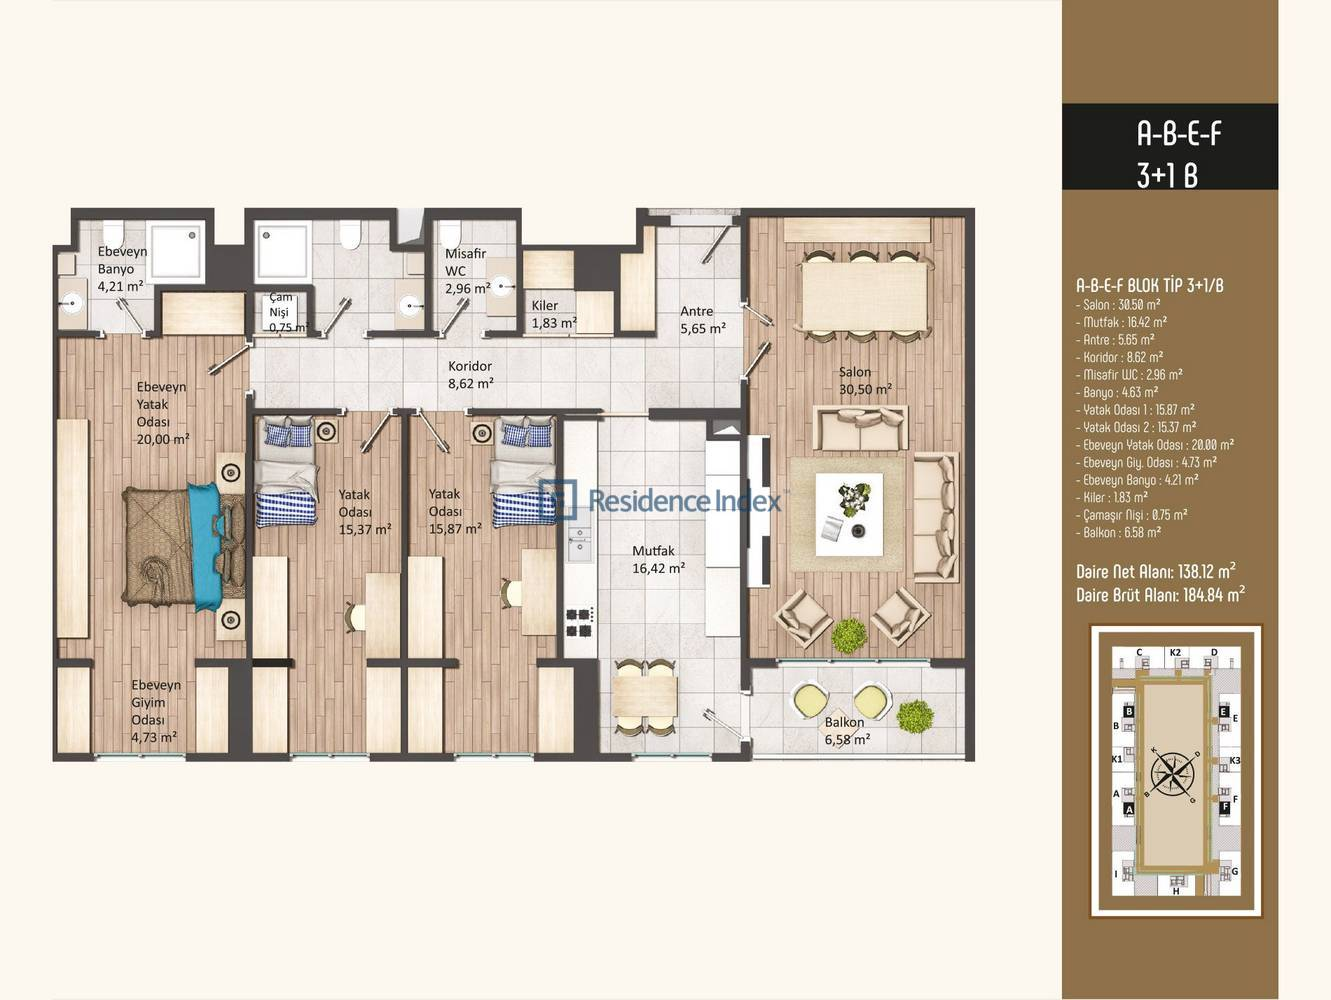 Kameroğlu Metrohome Residence 3+1 B